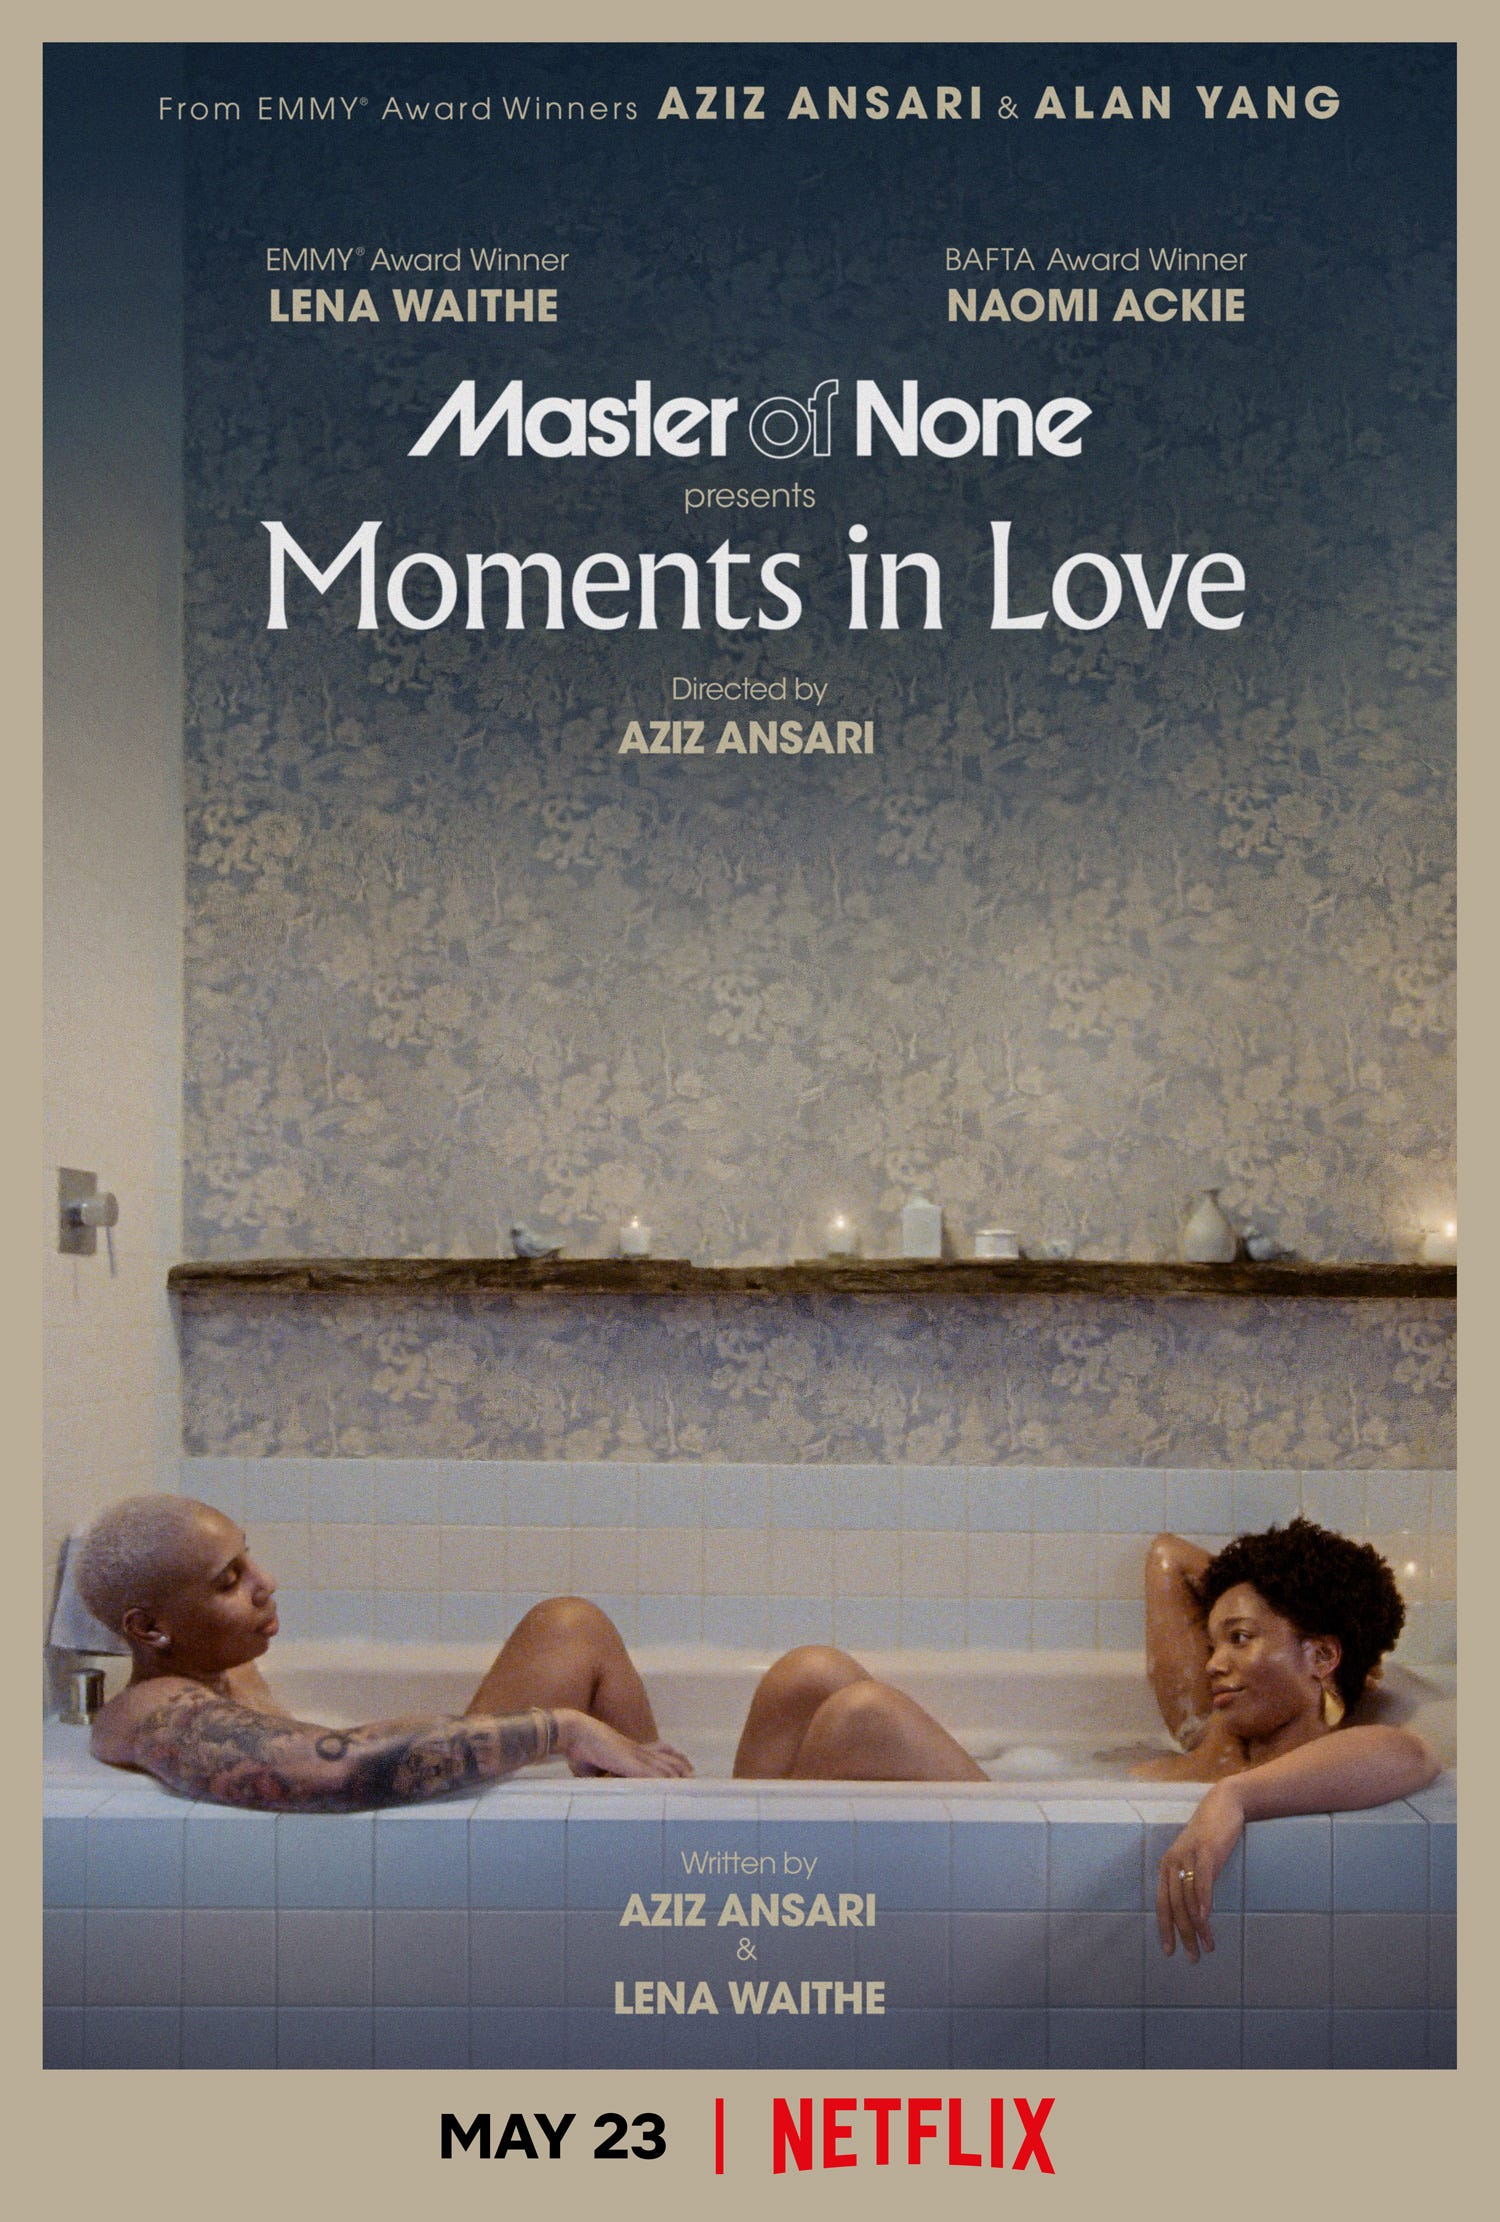 Netflix's 'Master of None' drops Season 3 trailer without Aziz Ansari